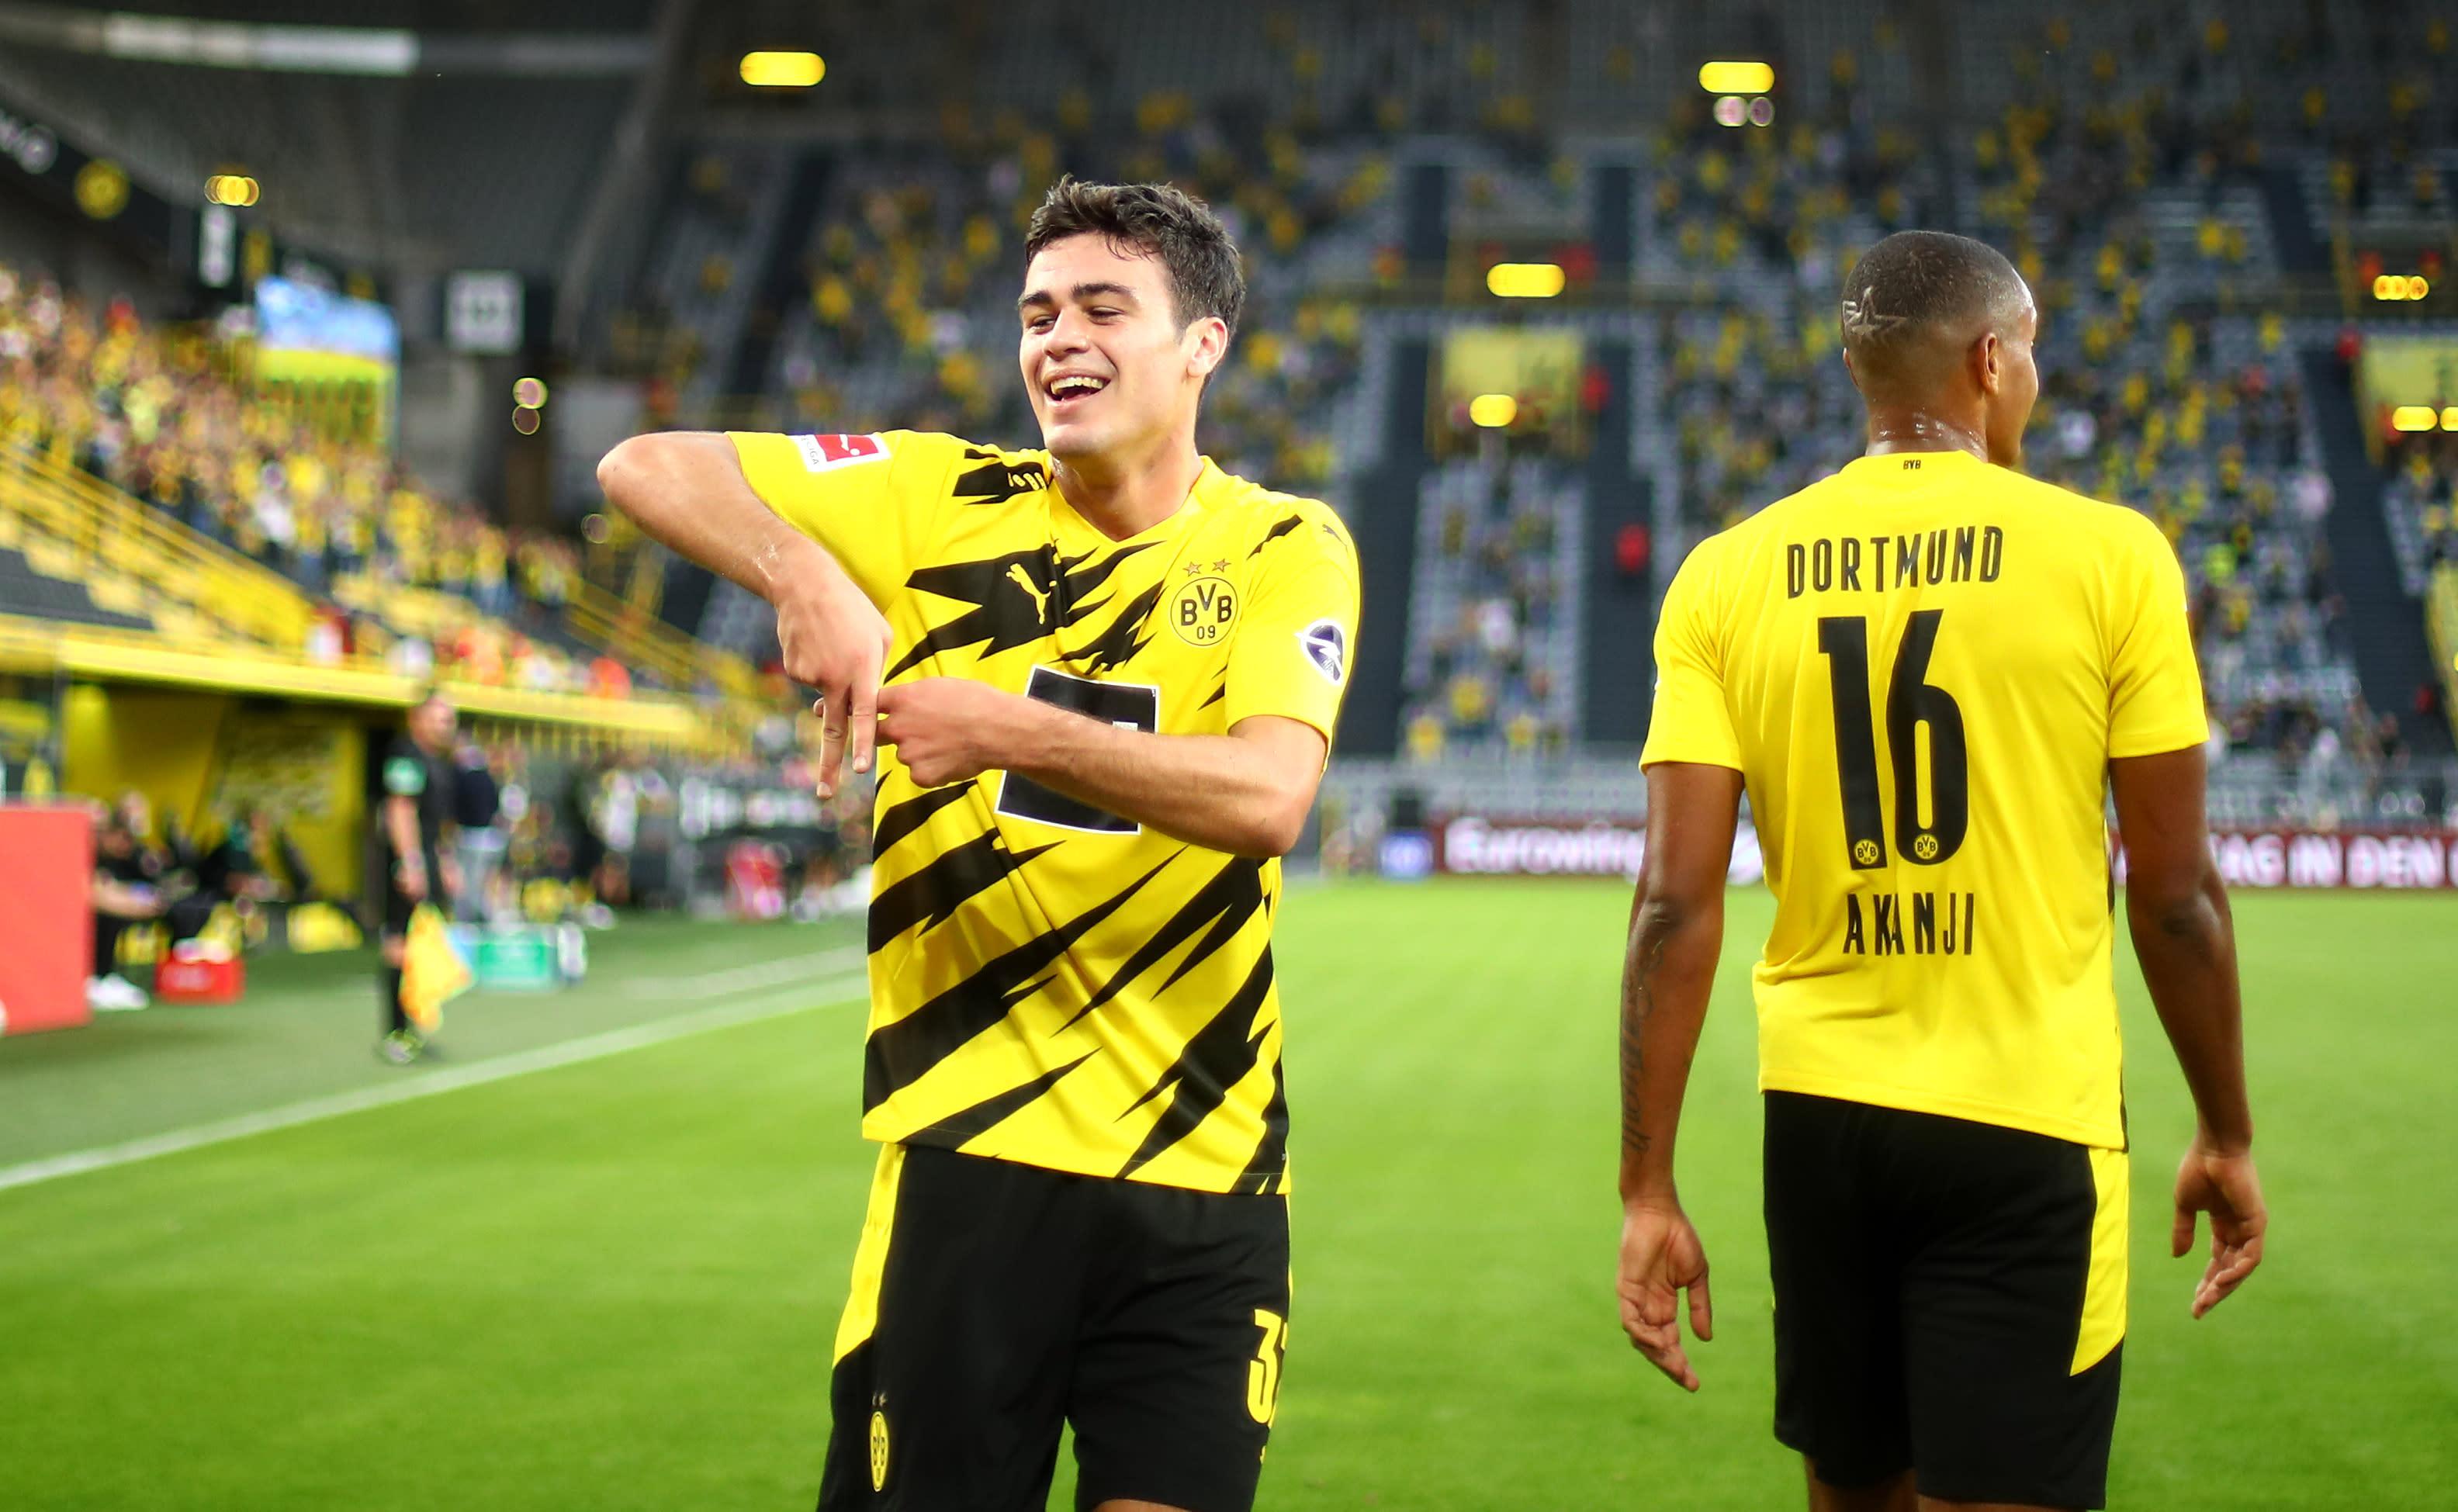 Watch: USMNT's Gio Reyna scores first Bundesliga goal for Dortmund